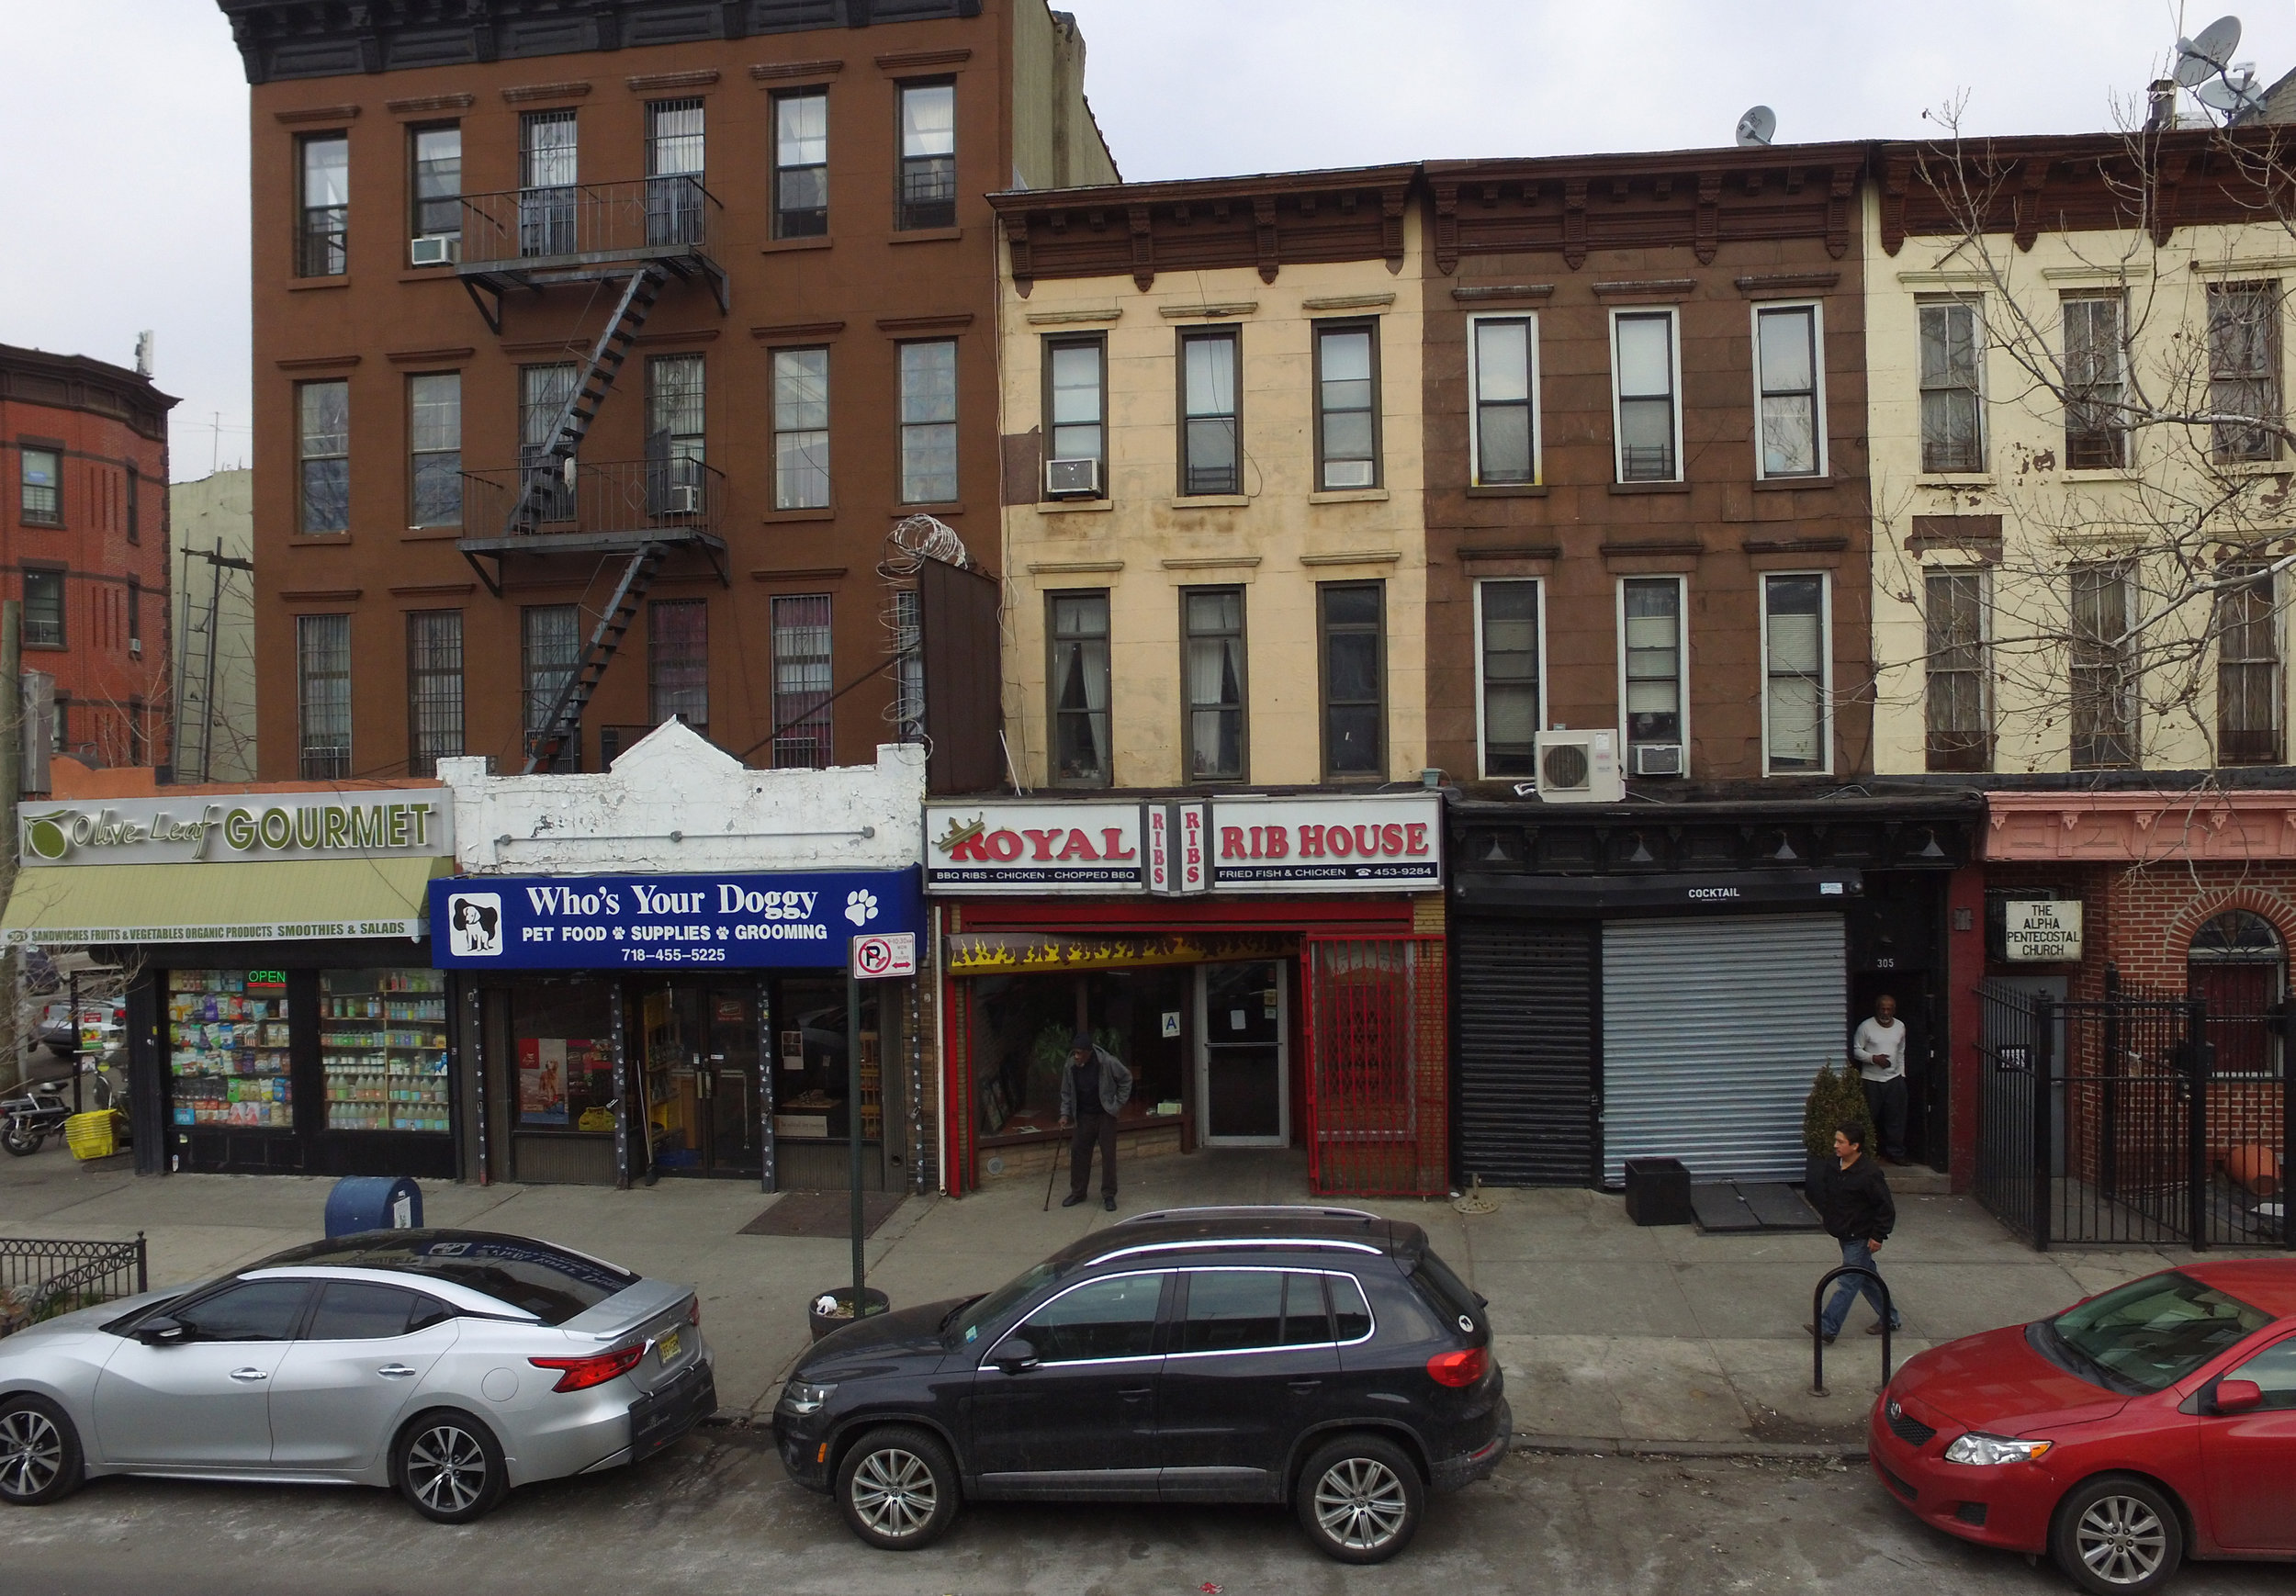 Royal Rib House, 303 Halsey St., Brooklyn. Photo:Darryl Montgomery, 2017.